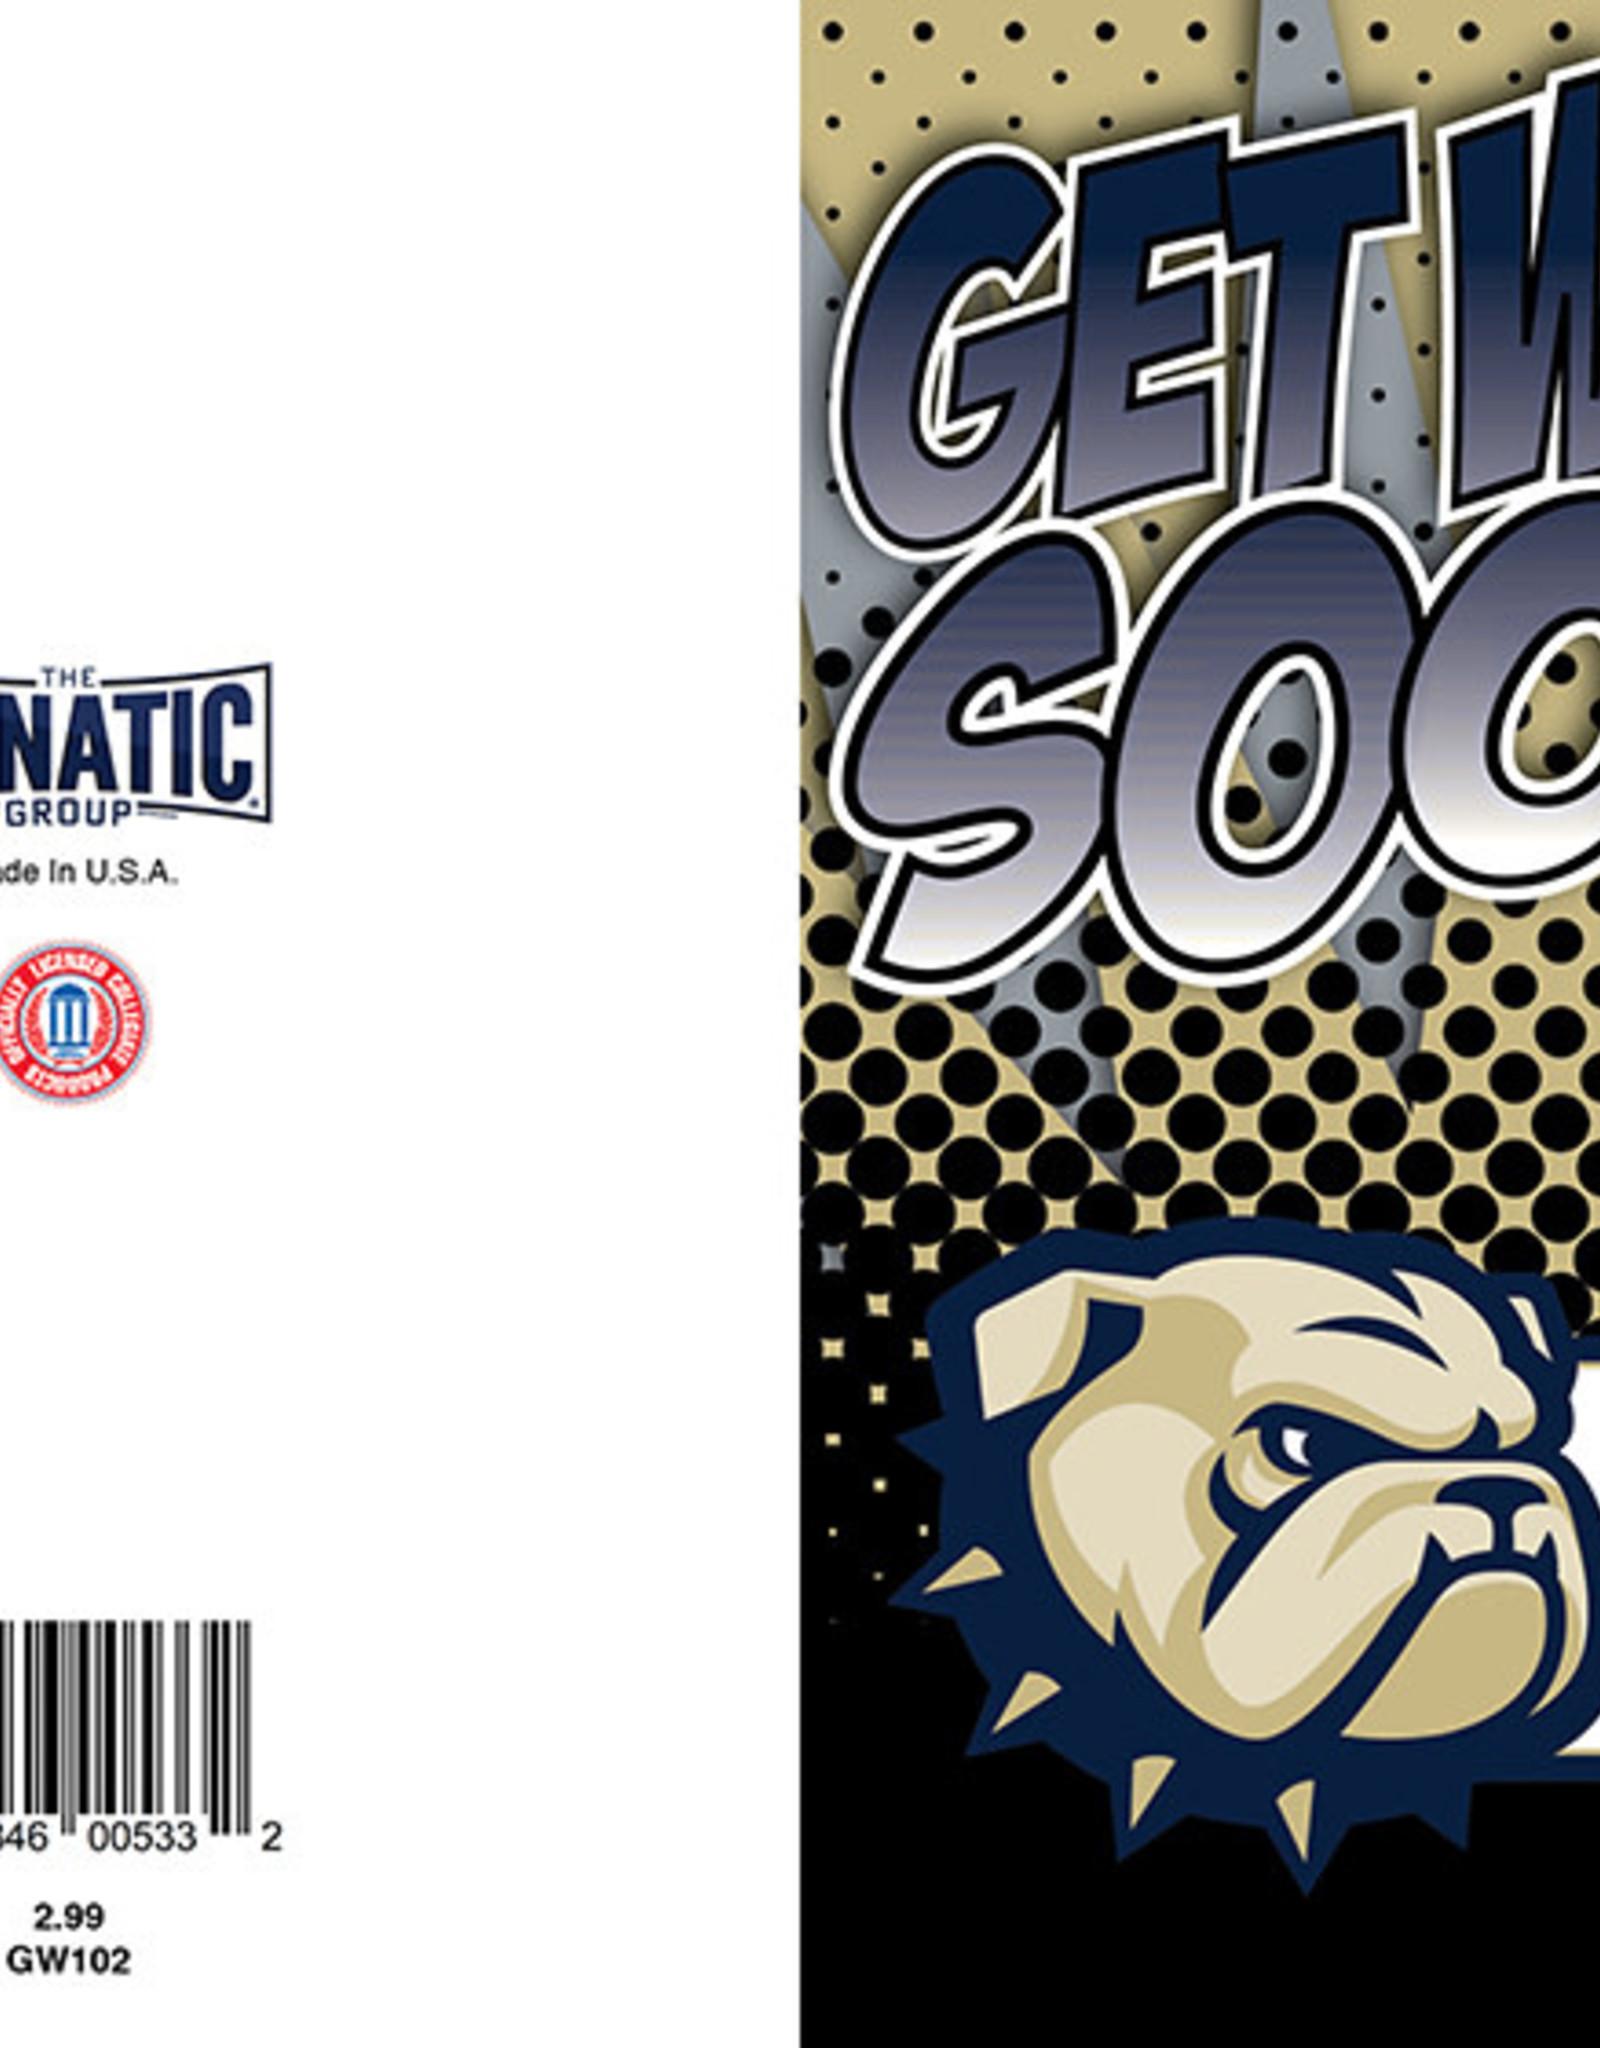 The Fanatic Group 5 x 7 Get Well Soon Go Bulldogs Card